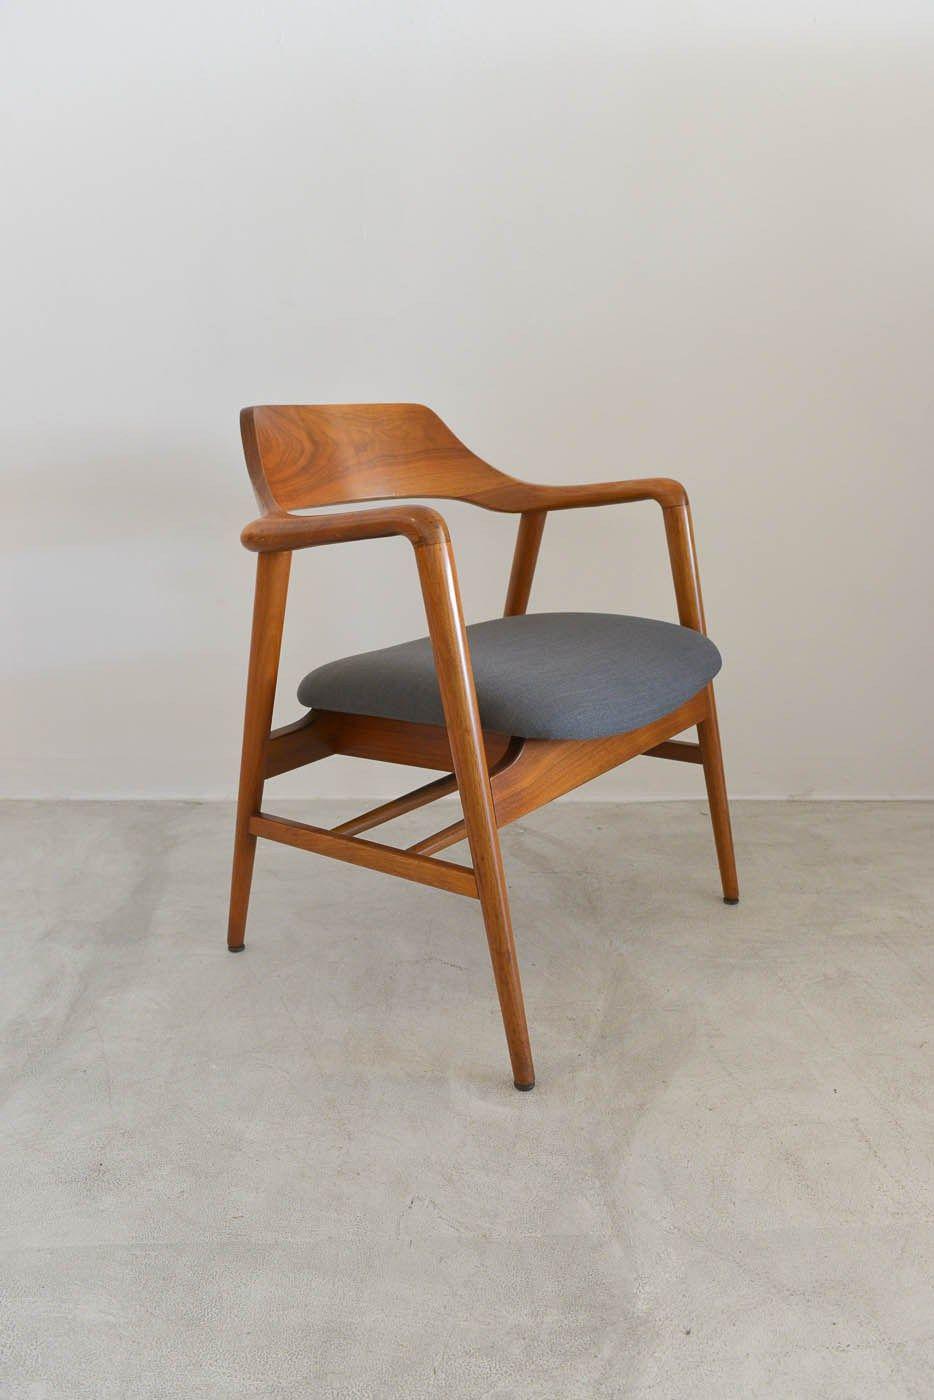 Sold Solid Walnut Sculputed Chair By Gunlocke Chair Mid Century